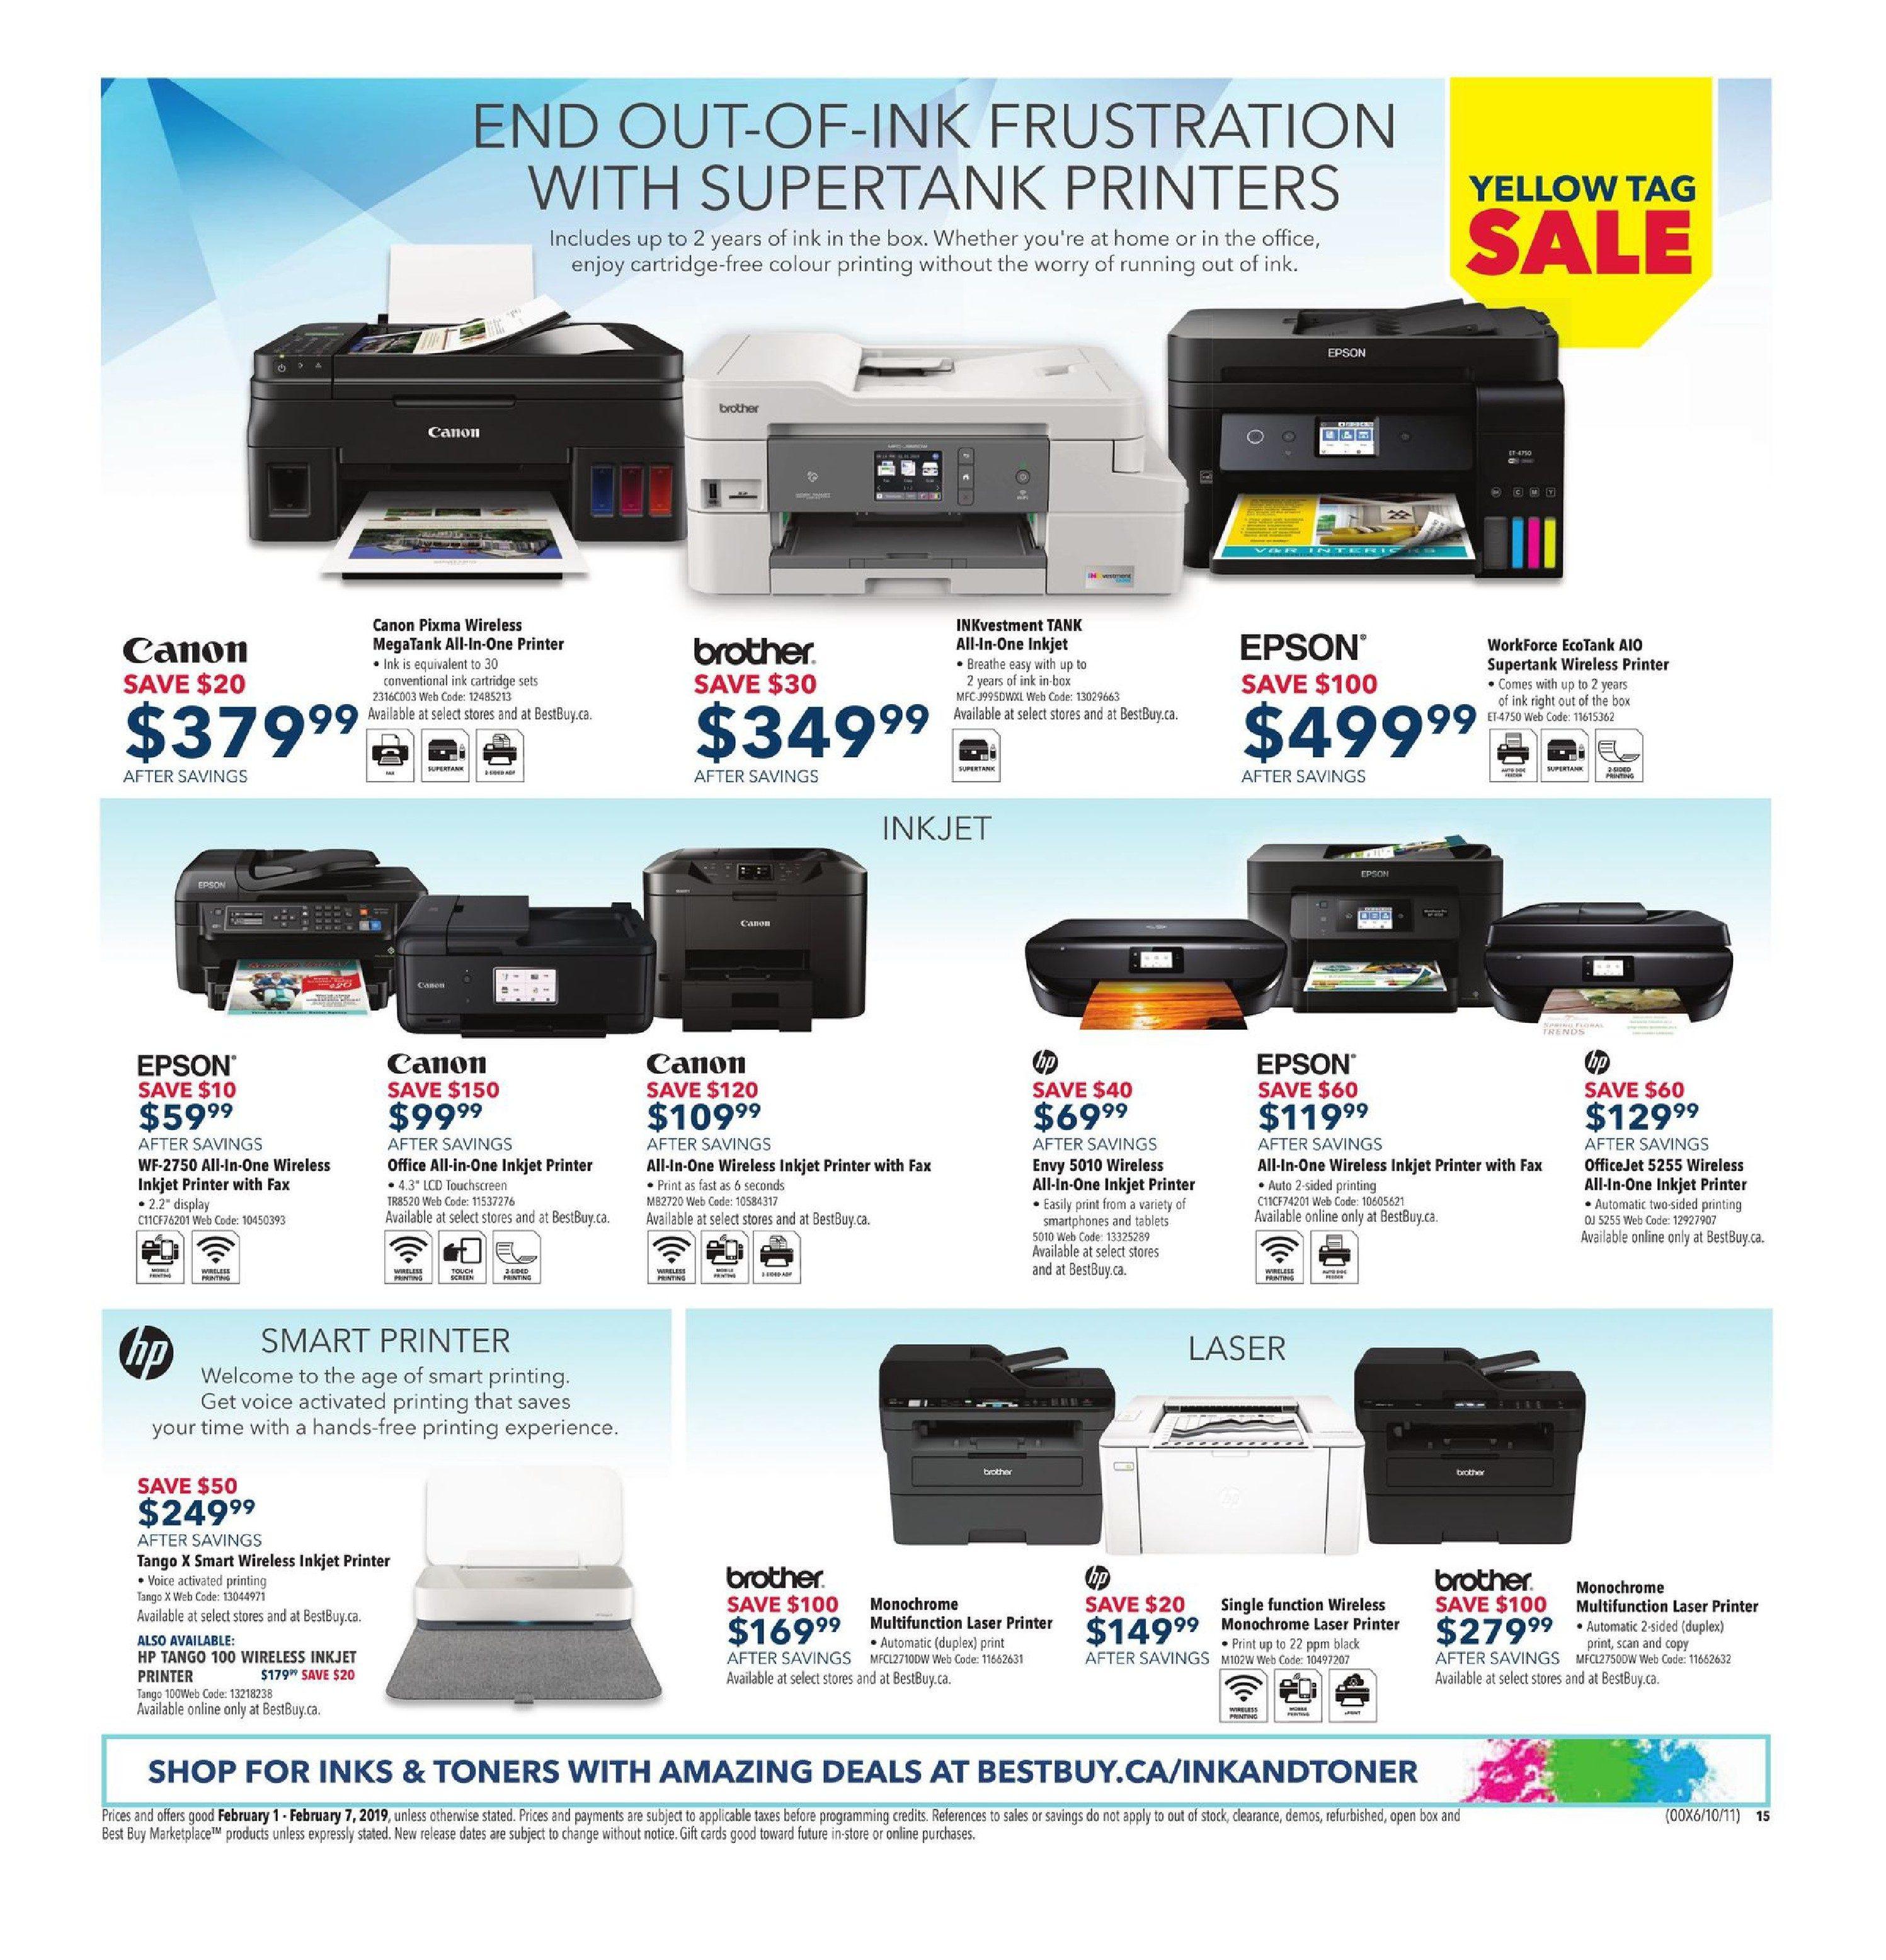 Best Buy Weekly Flyer - Weekly - Yellow Tag Sale - Feb 1 – 7